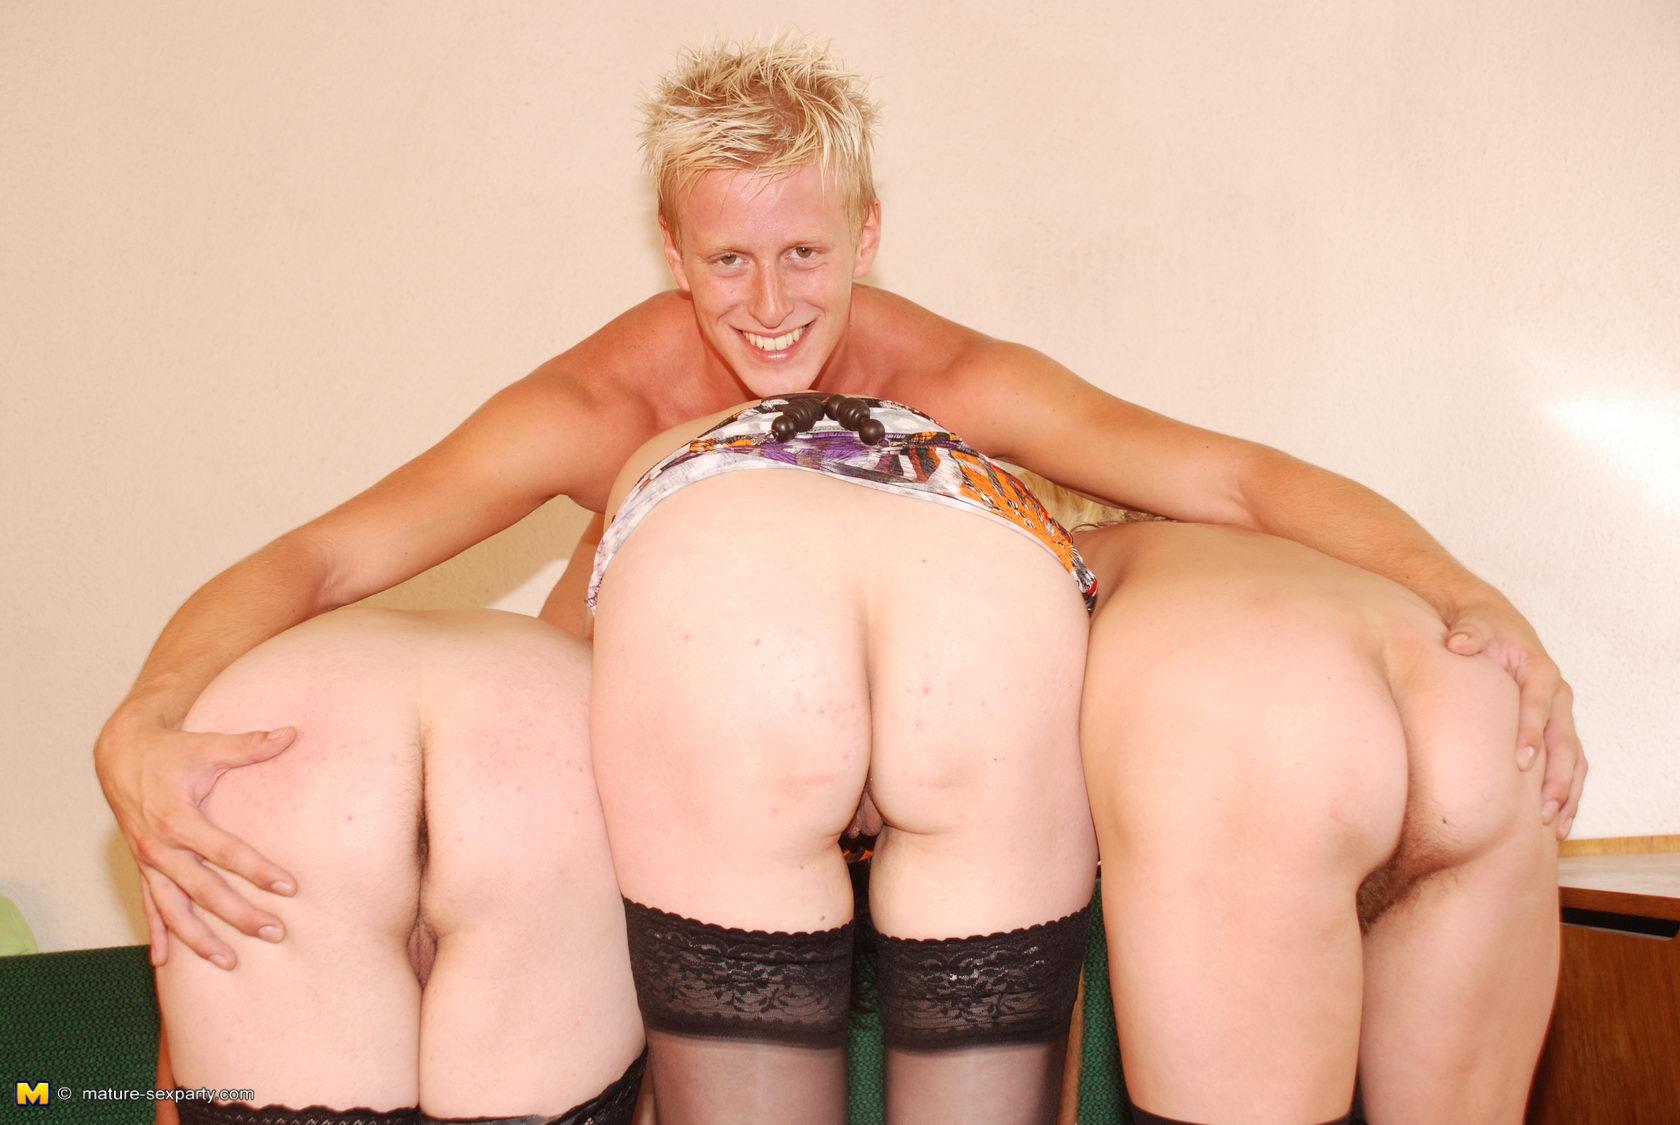 Фото эротика зрелых дам онлайн 18 фотография